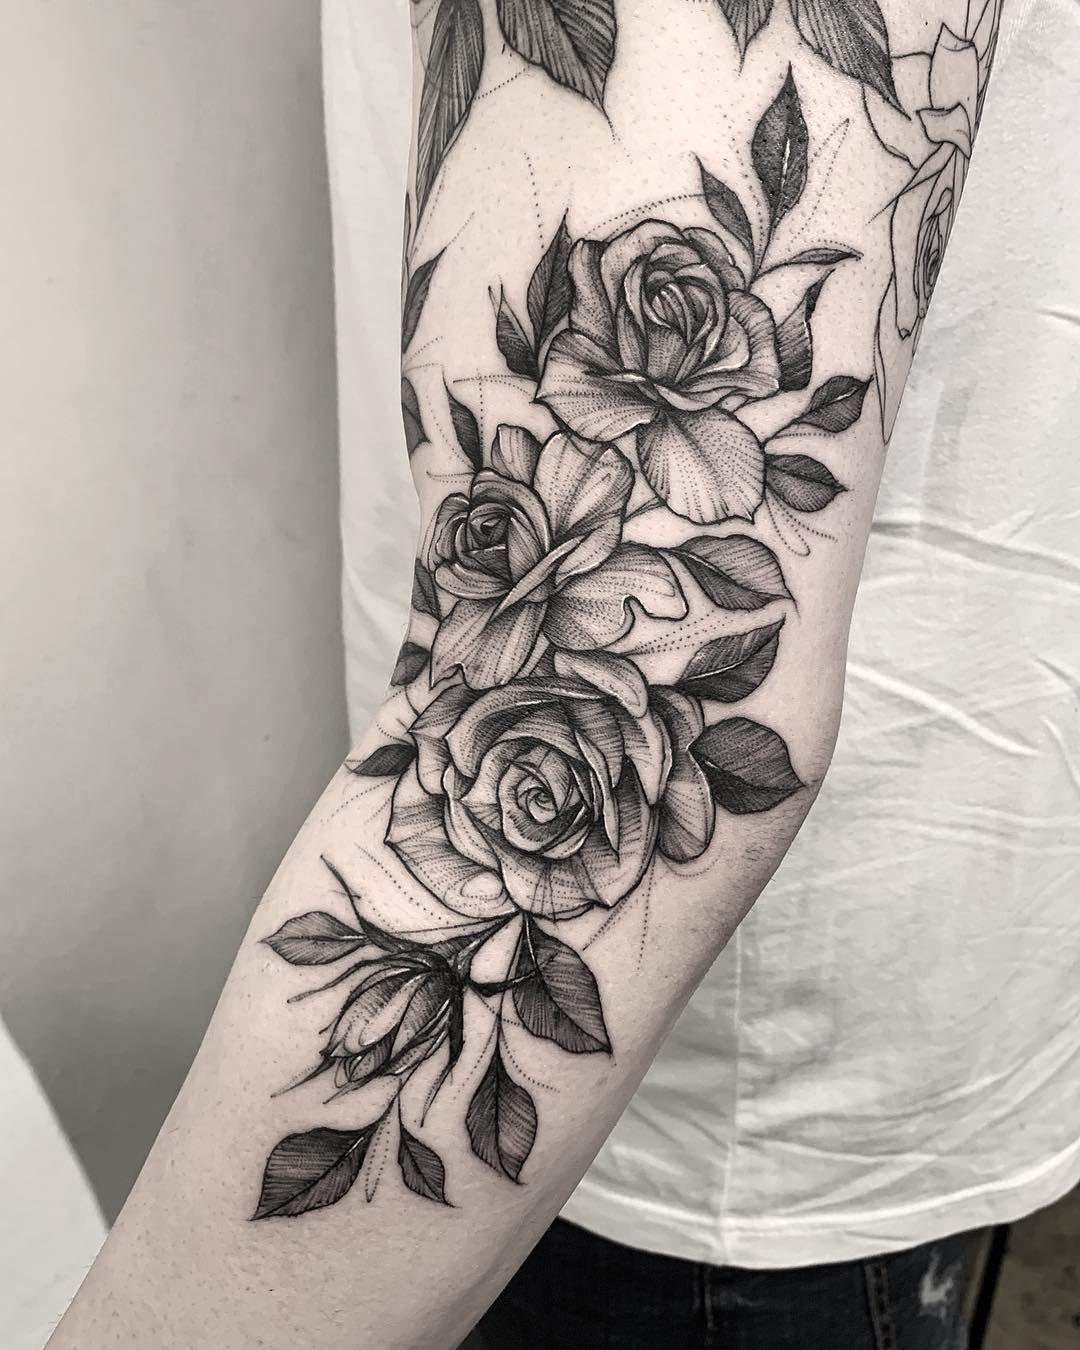 Sketchy Roses Tattoo C Tattoo Artist Bk Tattooer Rose Tattoo Tattoos Rose Tattoo Design